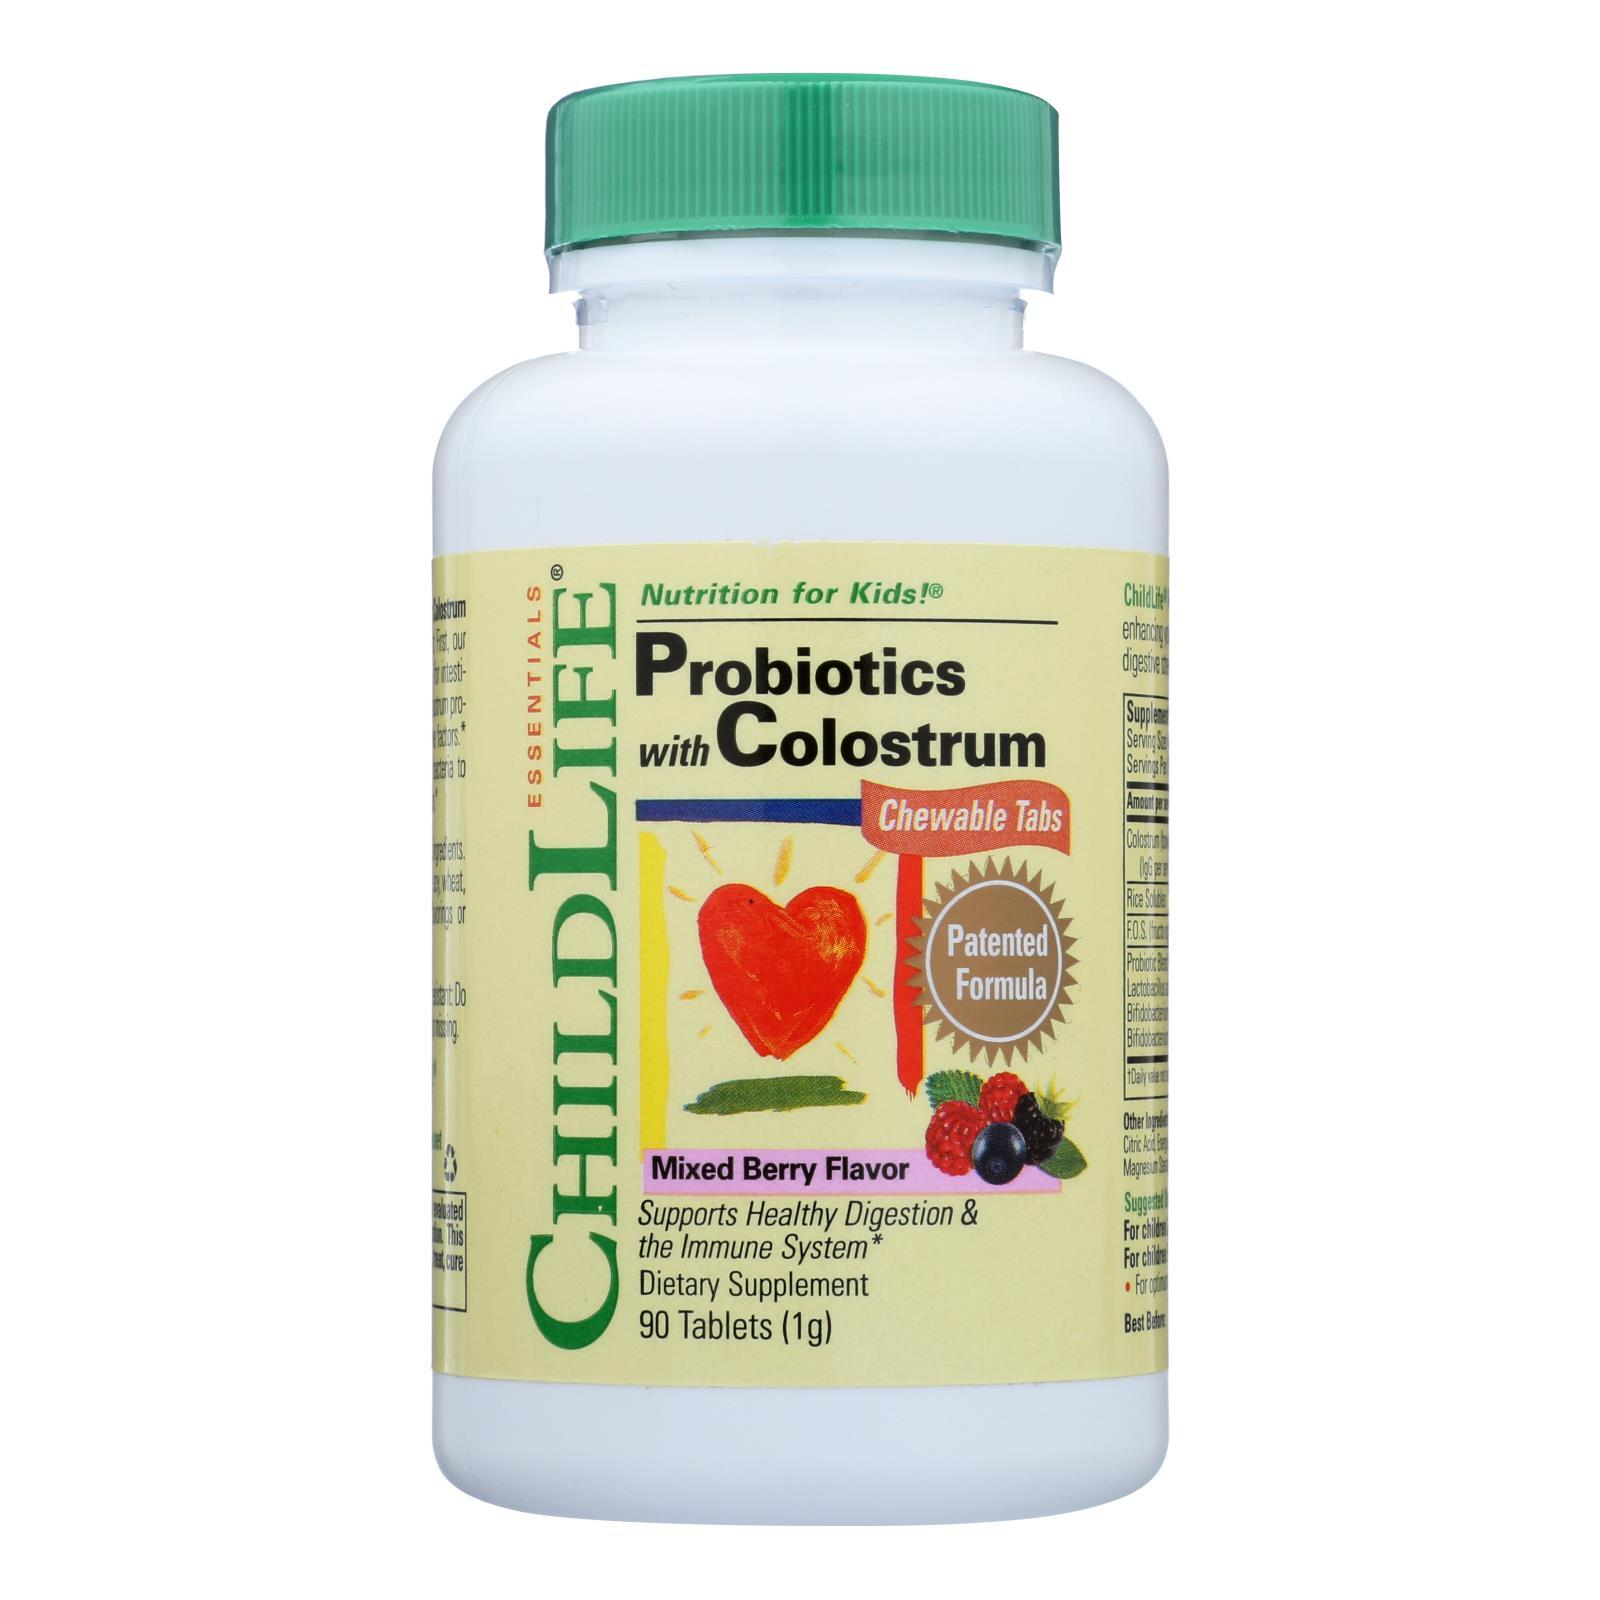 Childlife Probiotics Plus Colostrum Mixed Berry - 90 Chewable Tablets